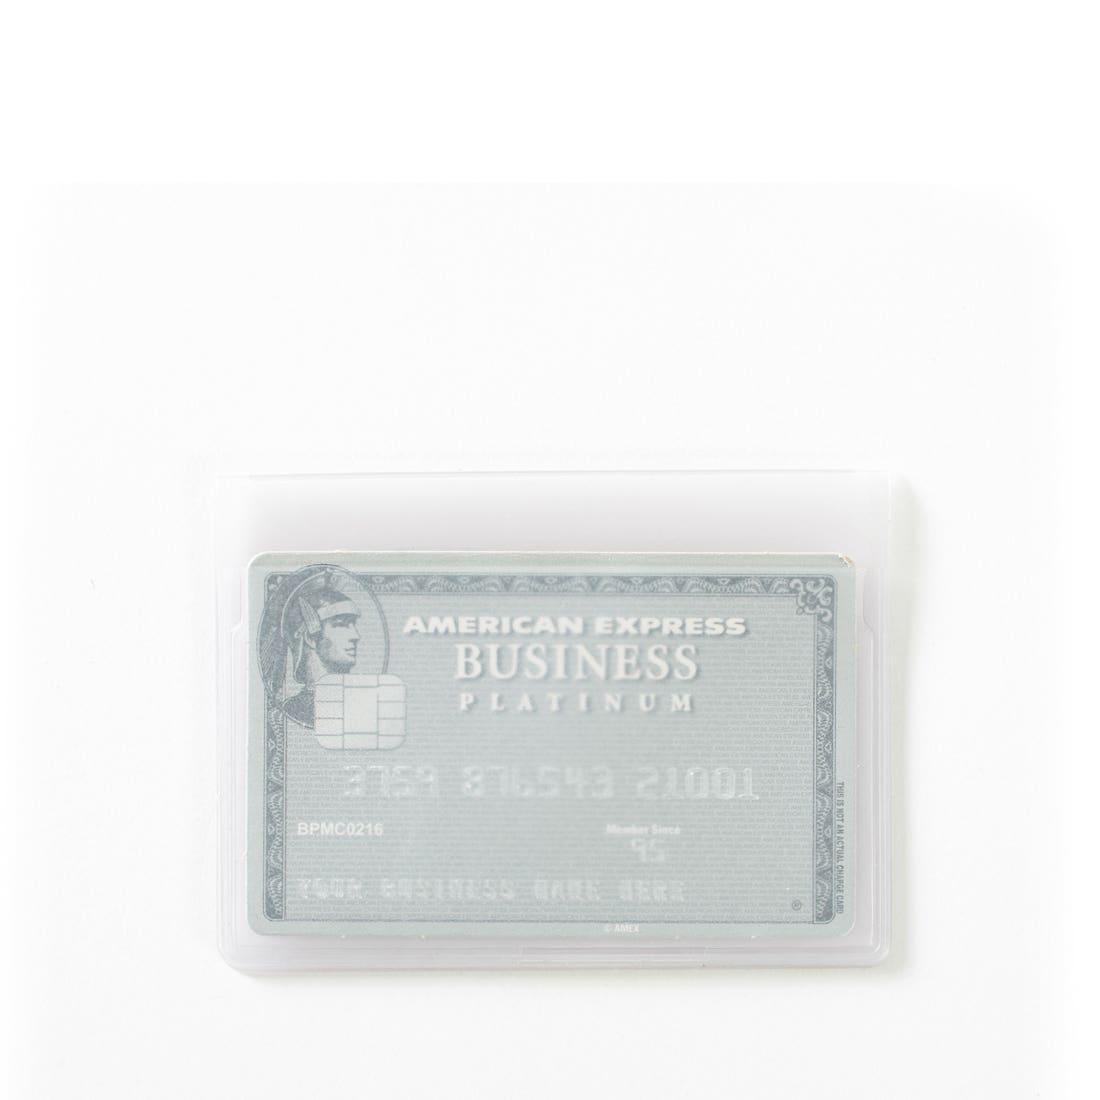 Photo Wallet Insert